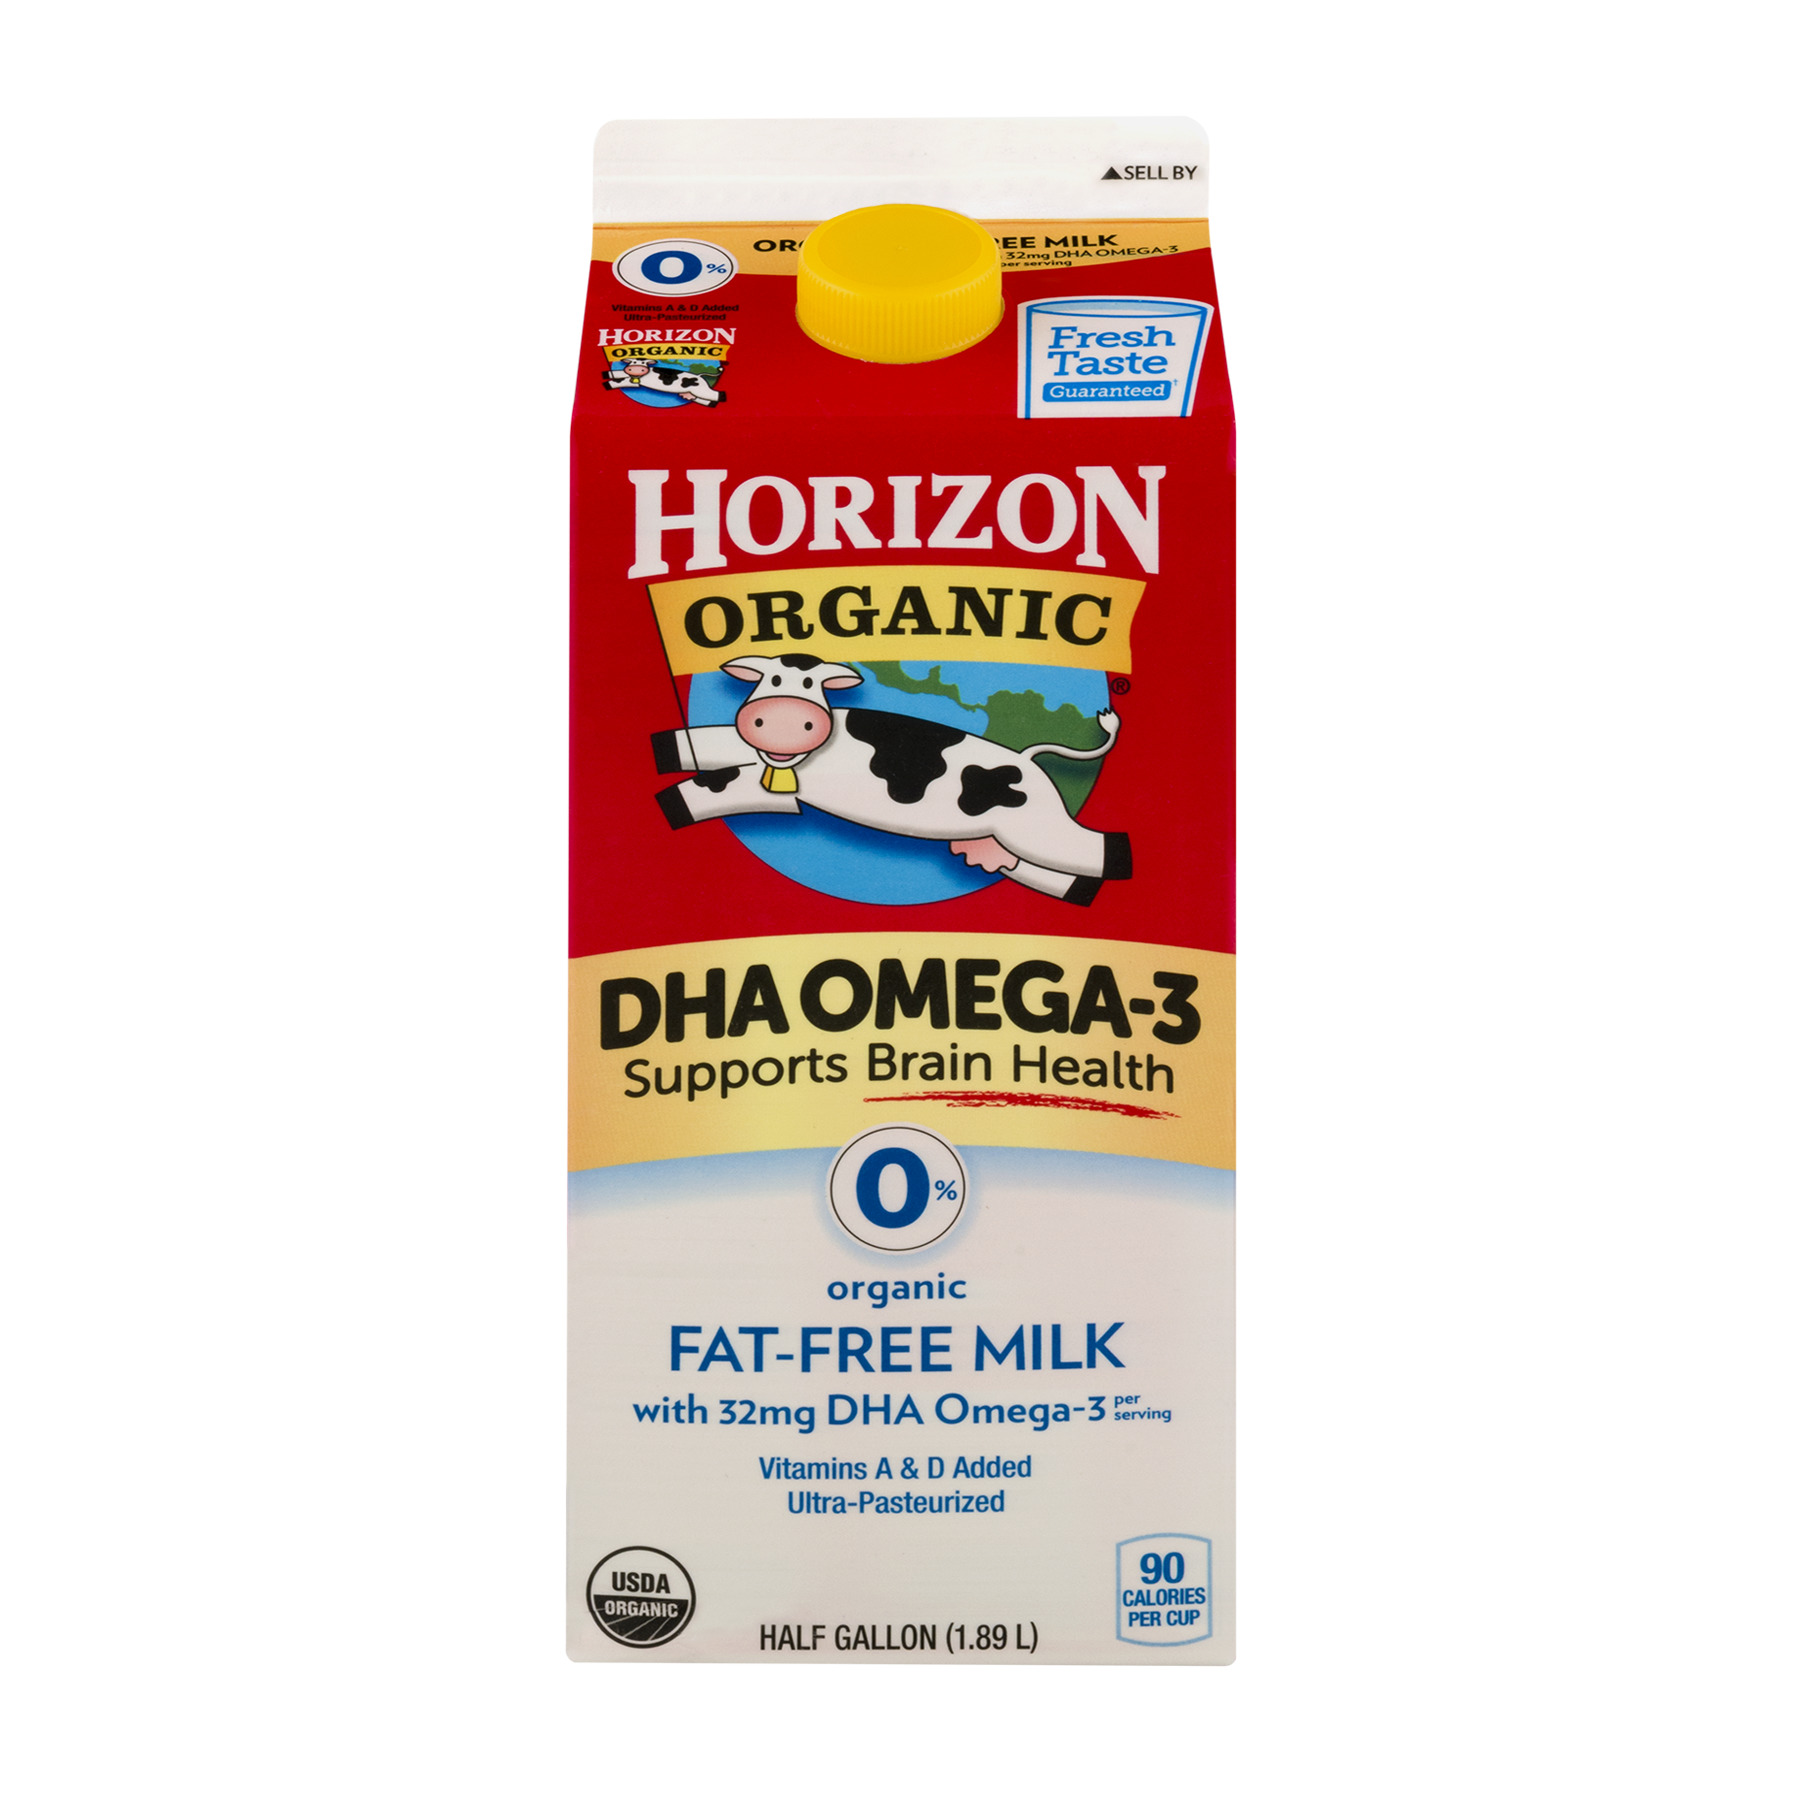 Horizon Organic 0% Fat-Free DHA Organic Milk, Half Gallon